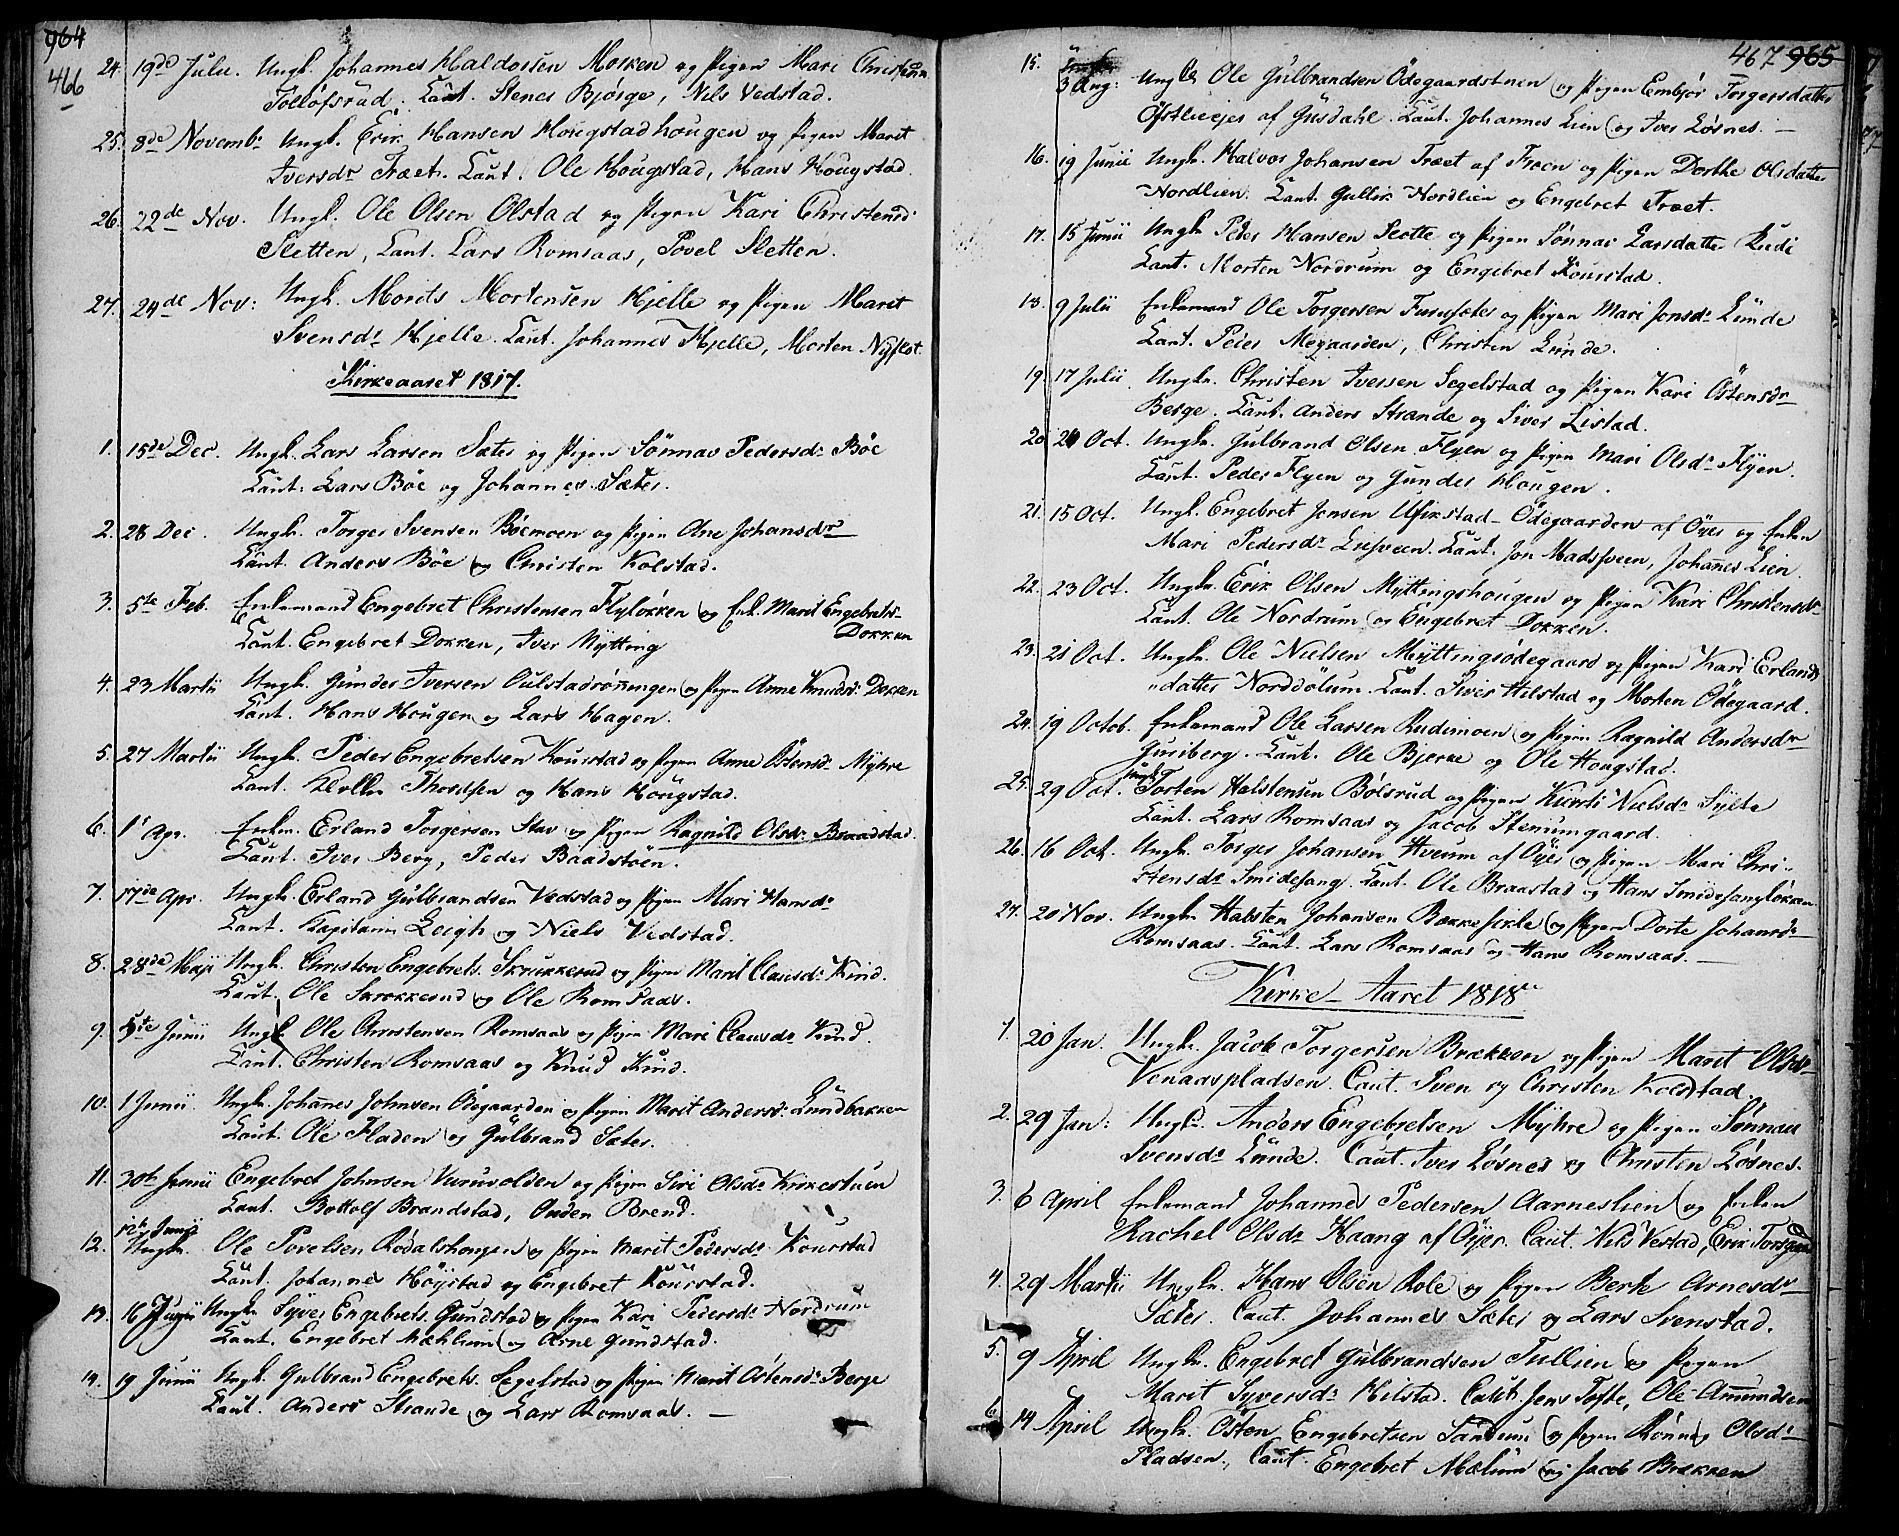 SAH, Ringebu prestekontor, Ministerialbok nr. 3, 1781-1820, s. 466-467